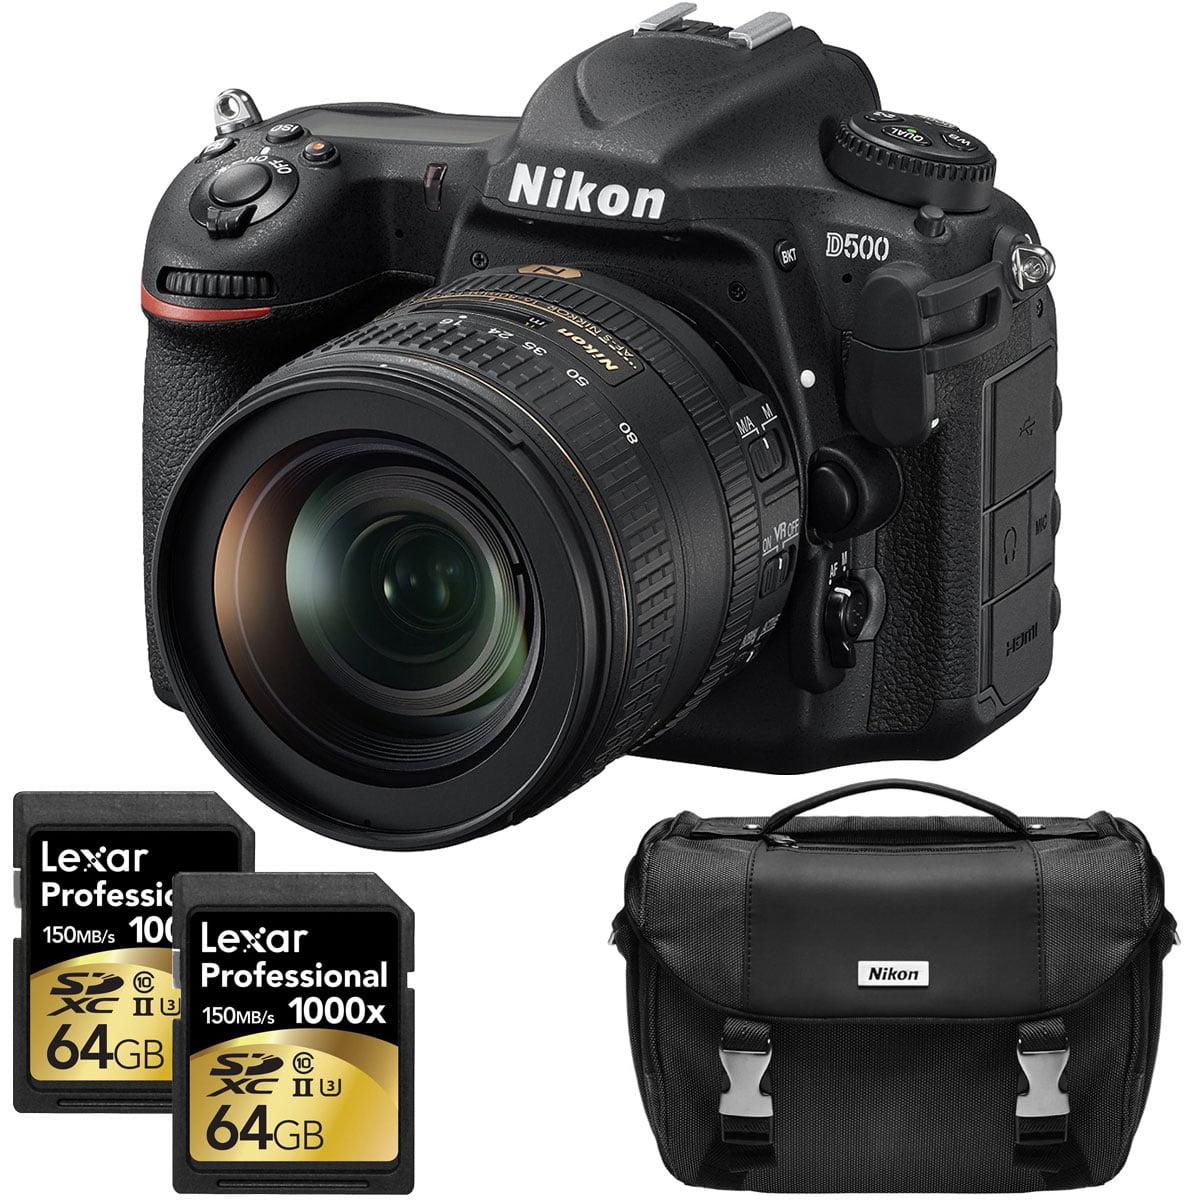 Nikon D500 20.9 MP CMOS DX Format Digital SLR Camera w/ AF-S DX NIKKOR 16-80mm f/2.8-4E ED VR Lens Kit Includes Dual Lexar 64GB Professional 1000x SDXC Memory Cards and Nikon Deluxe SLR Camera Bag